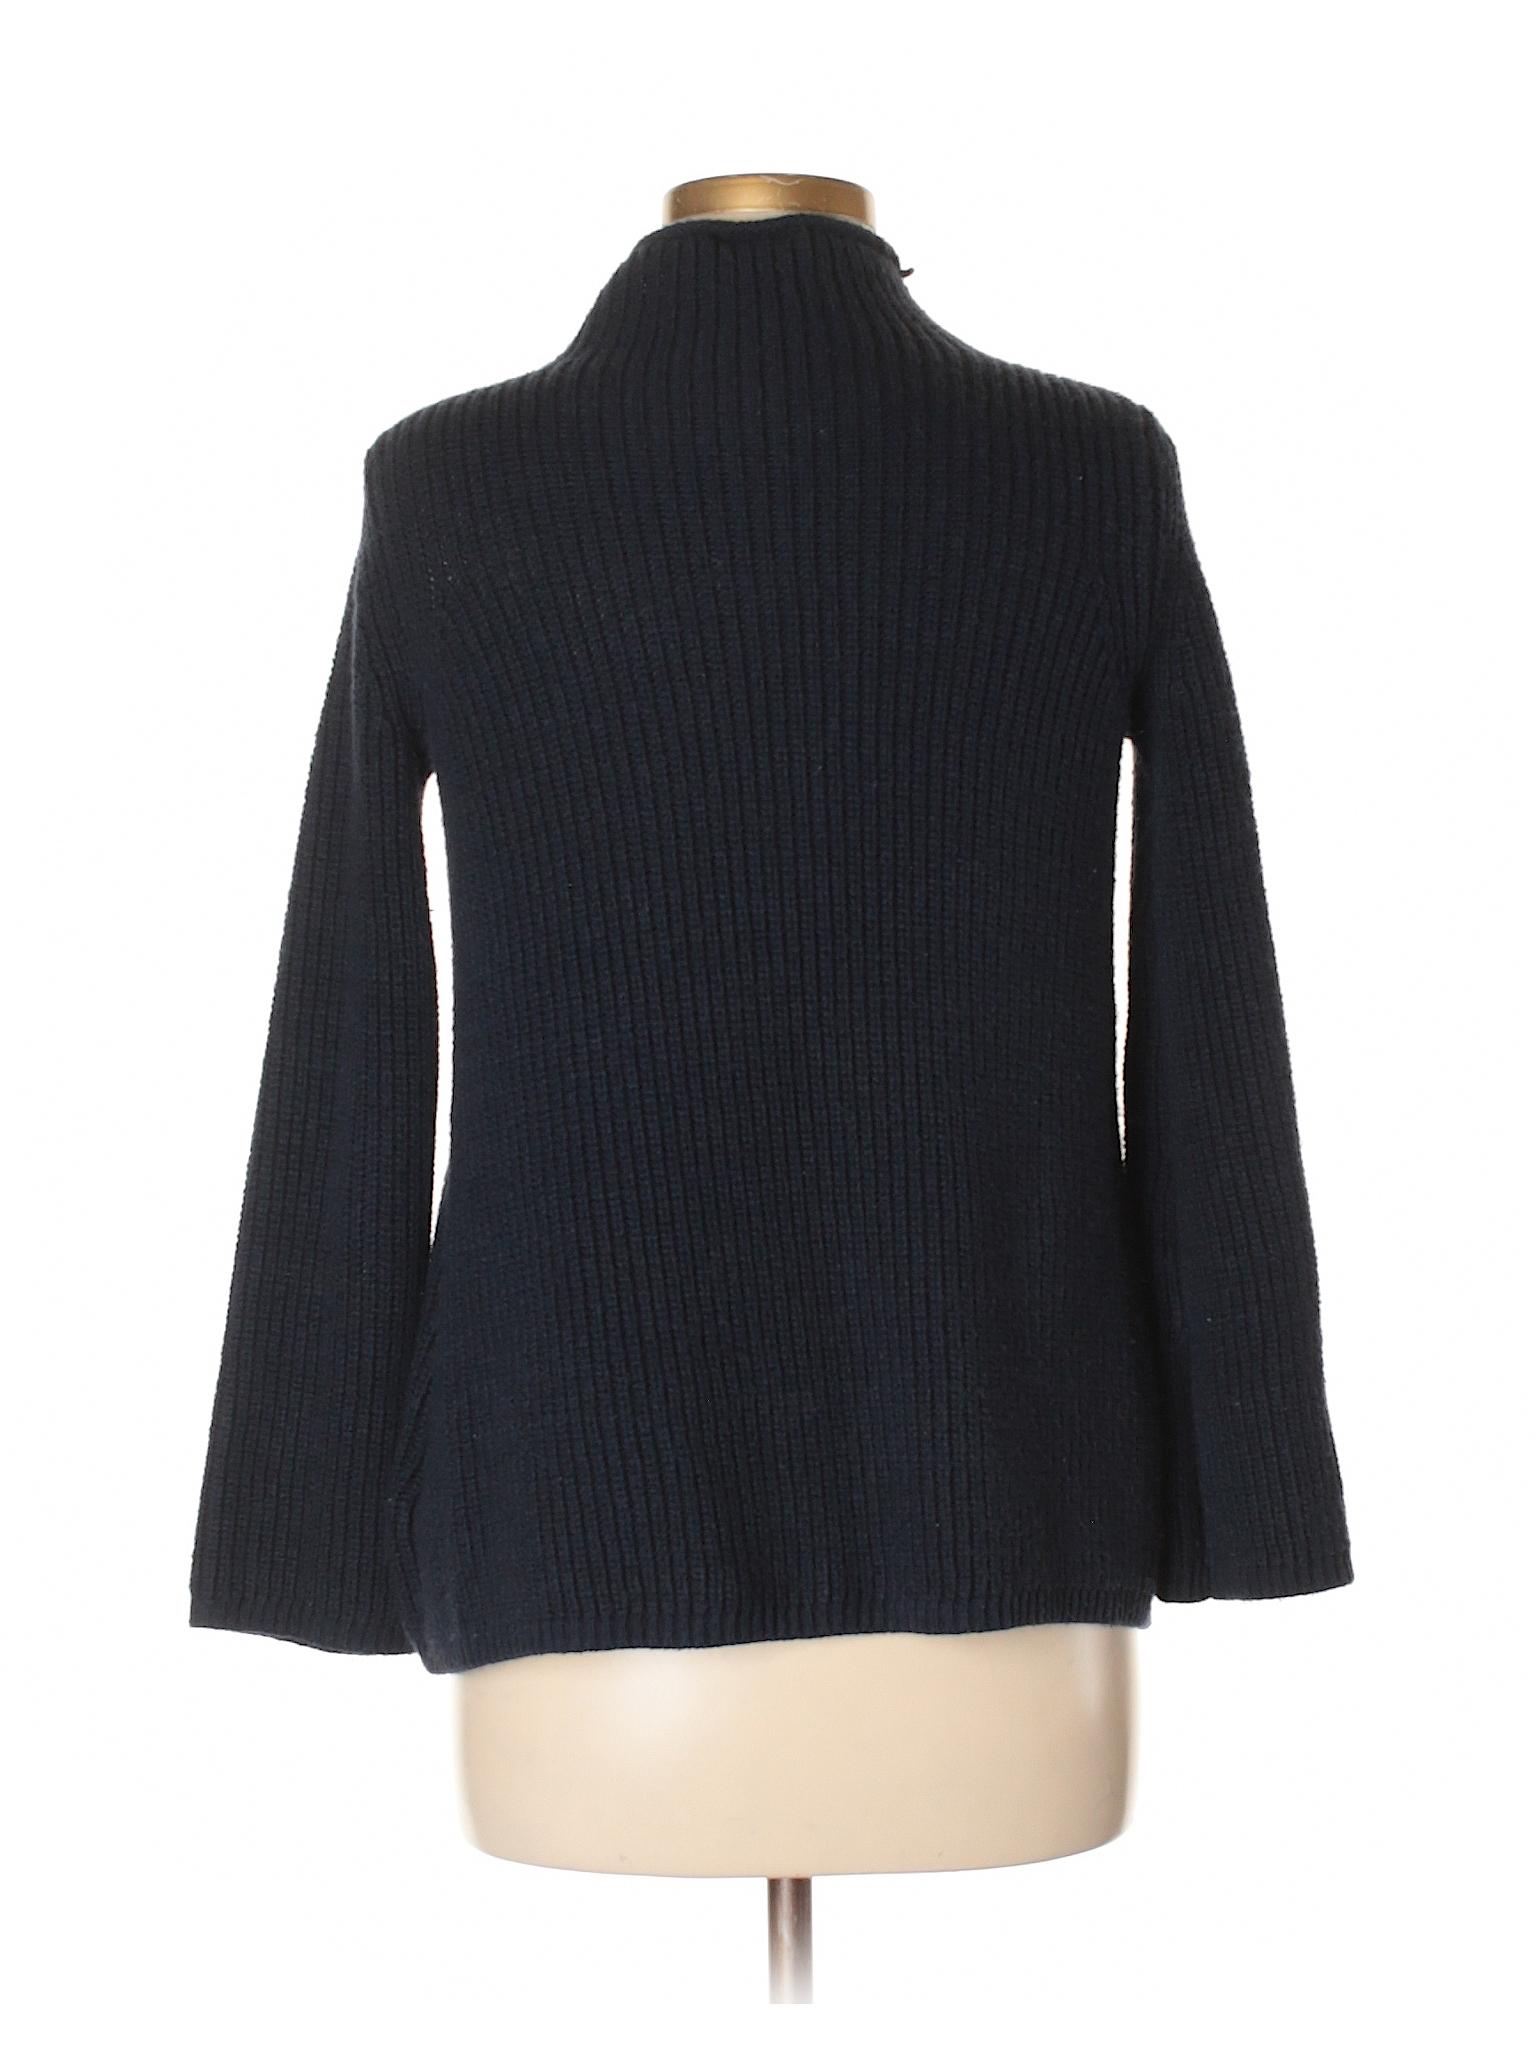 Boutique Topshop Topshop Boutique Sweater Pullover 1wP0Sdwq